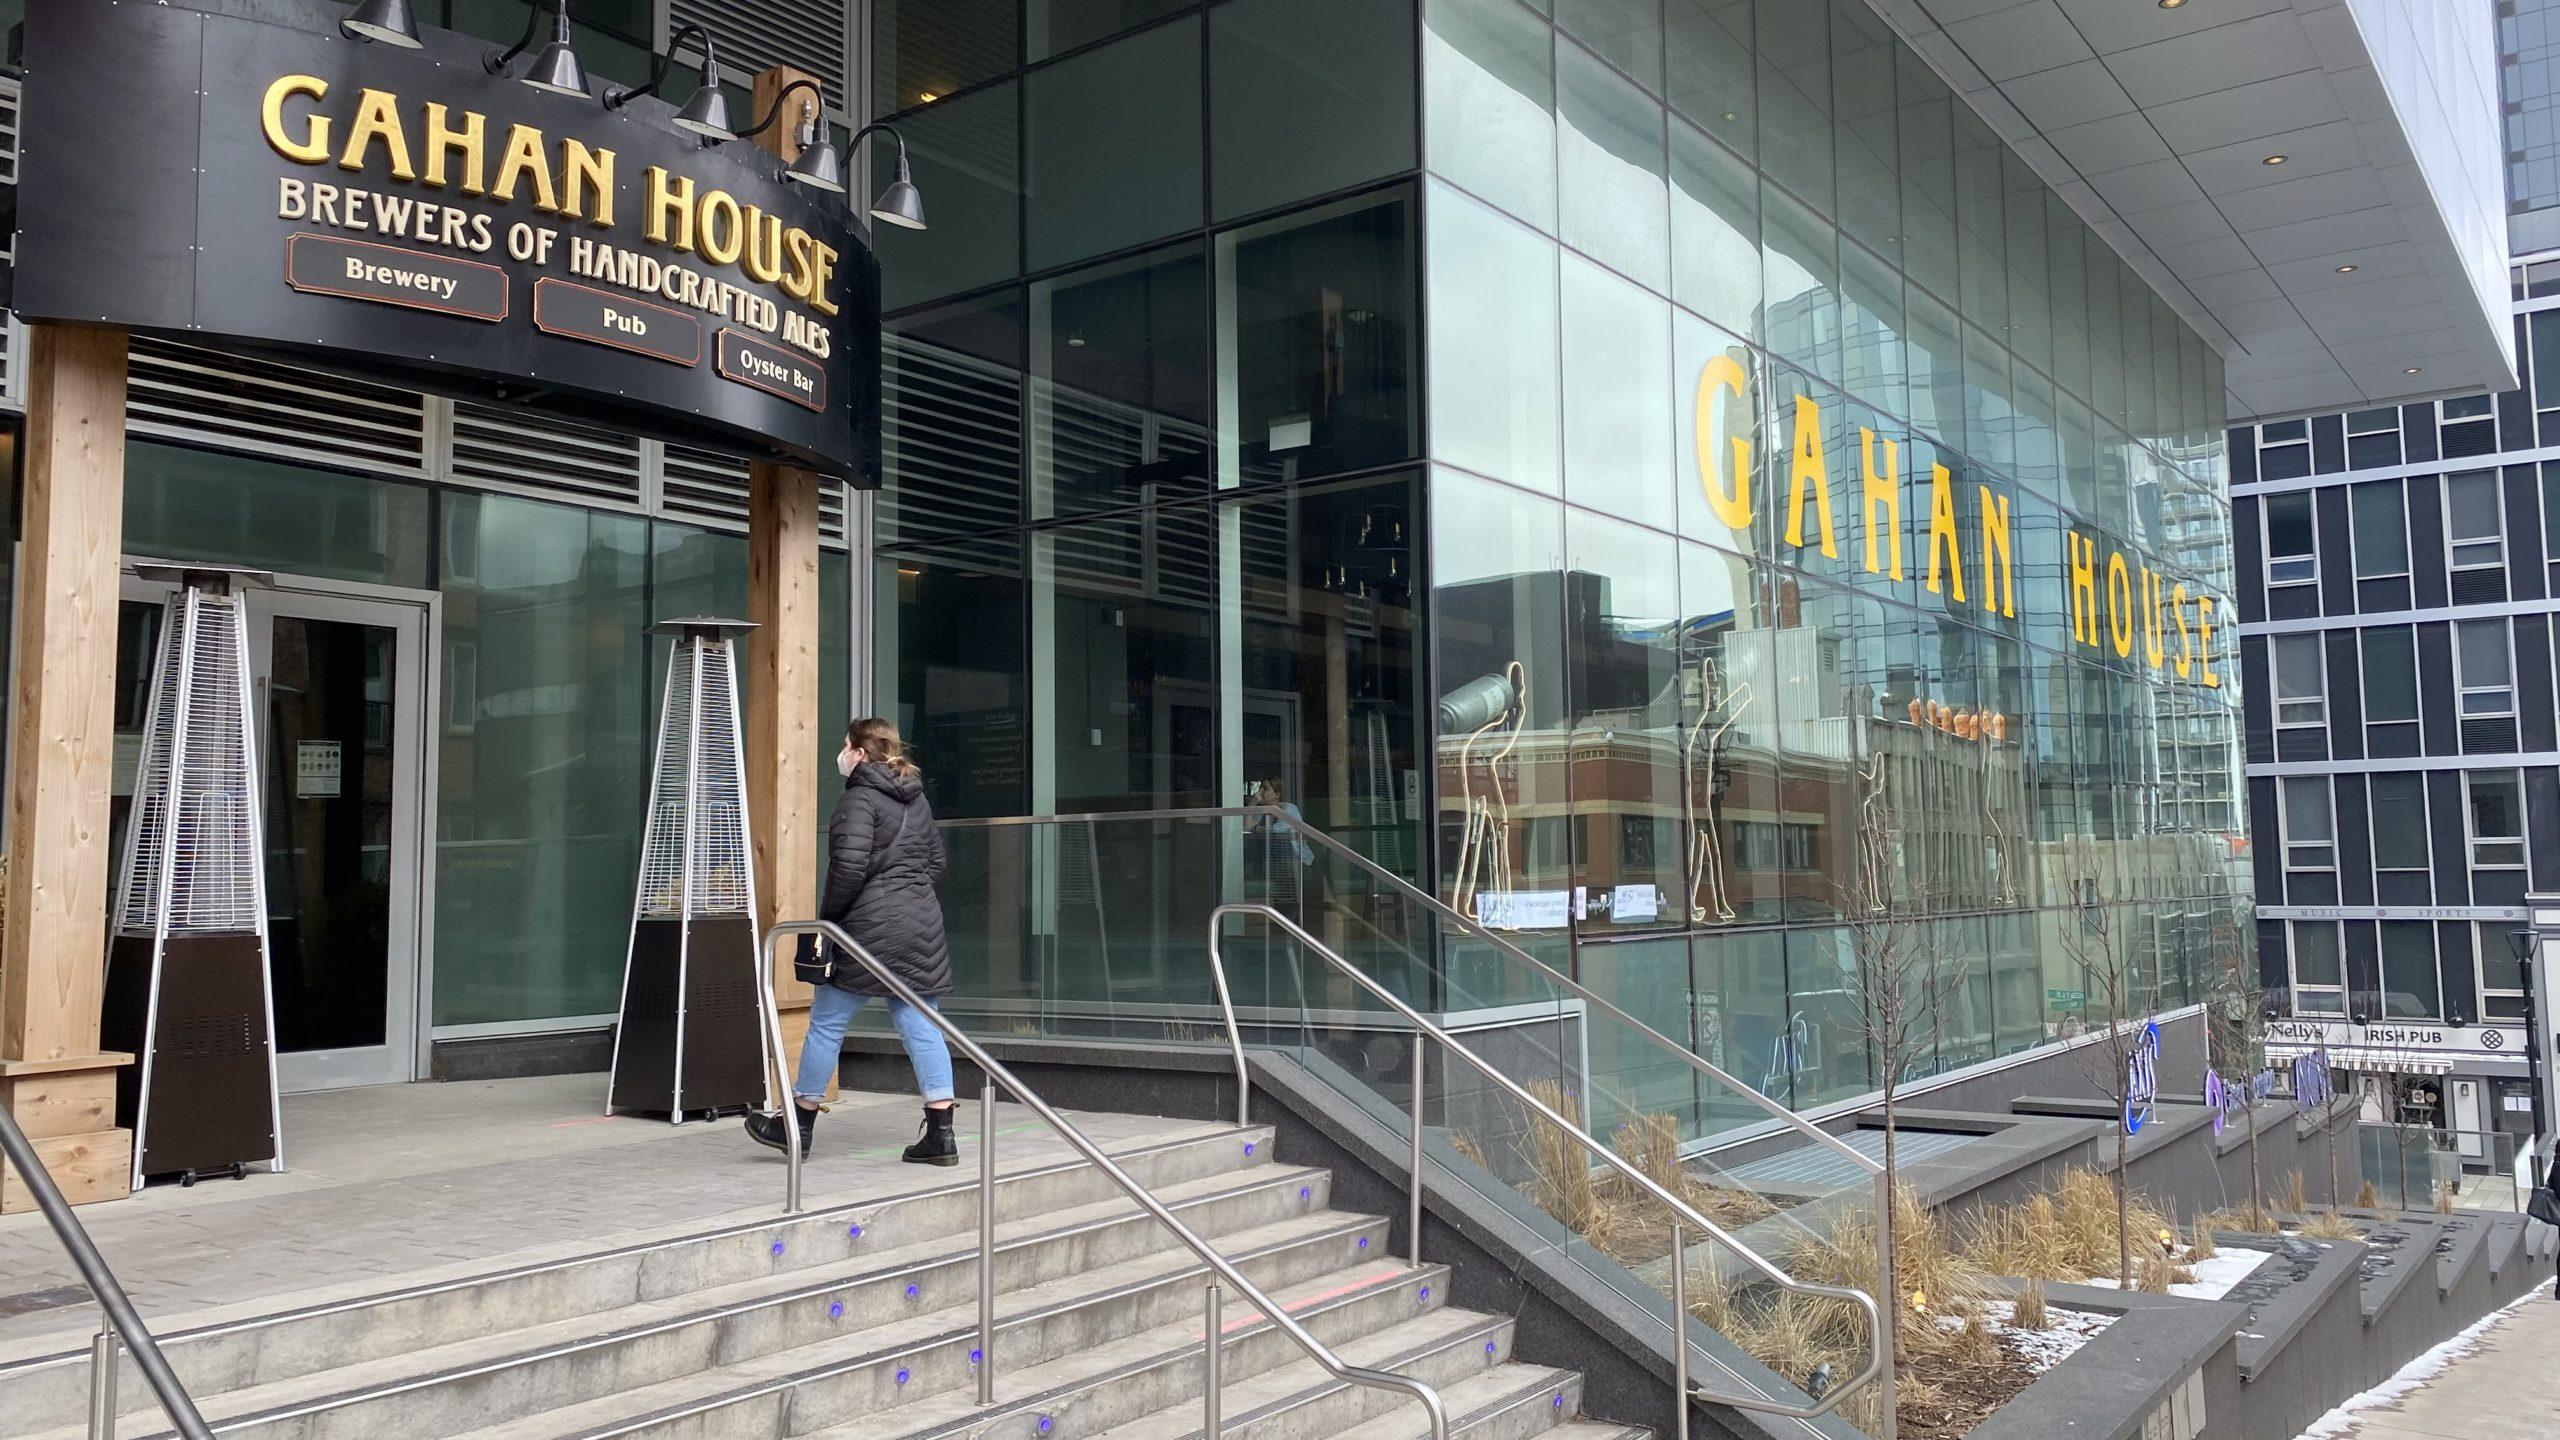 Gahan House Nova Centre in downtown Halifax.